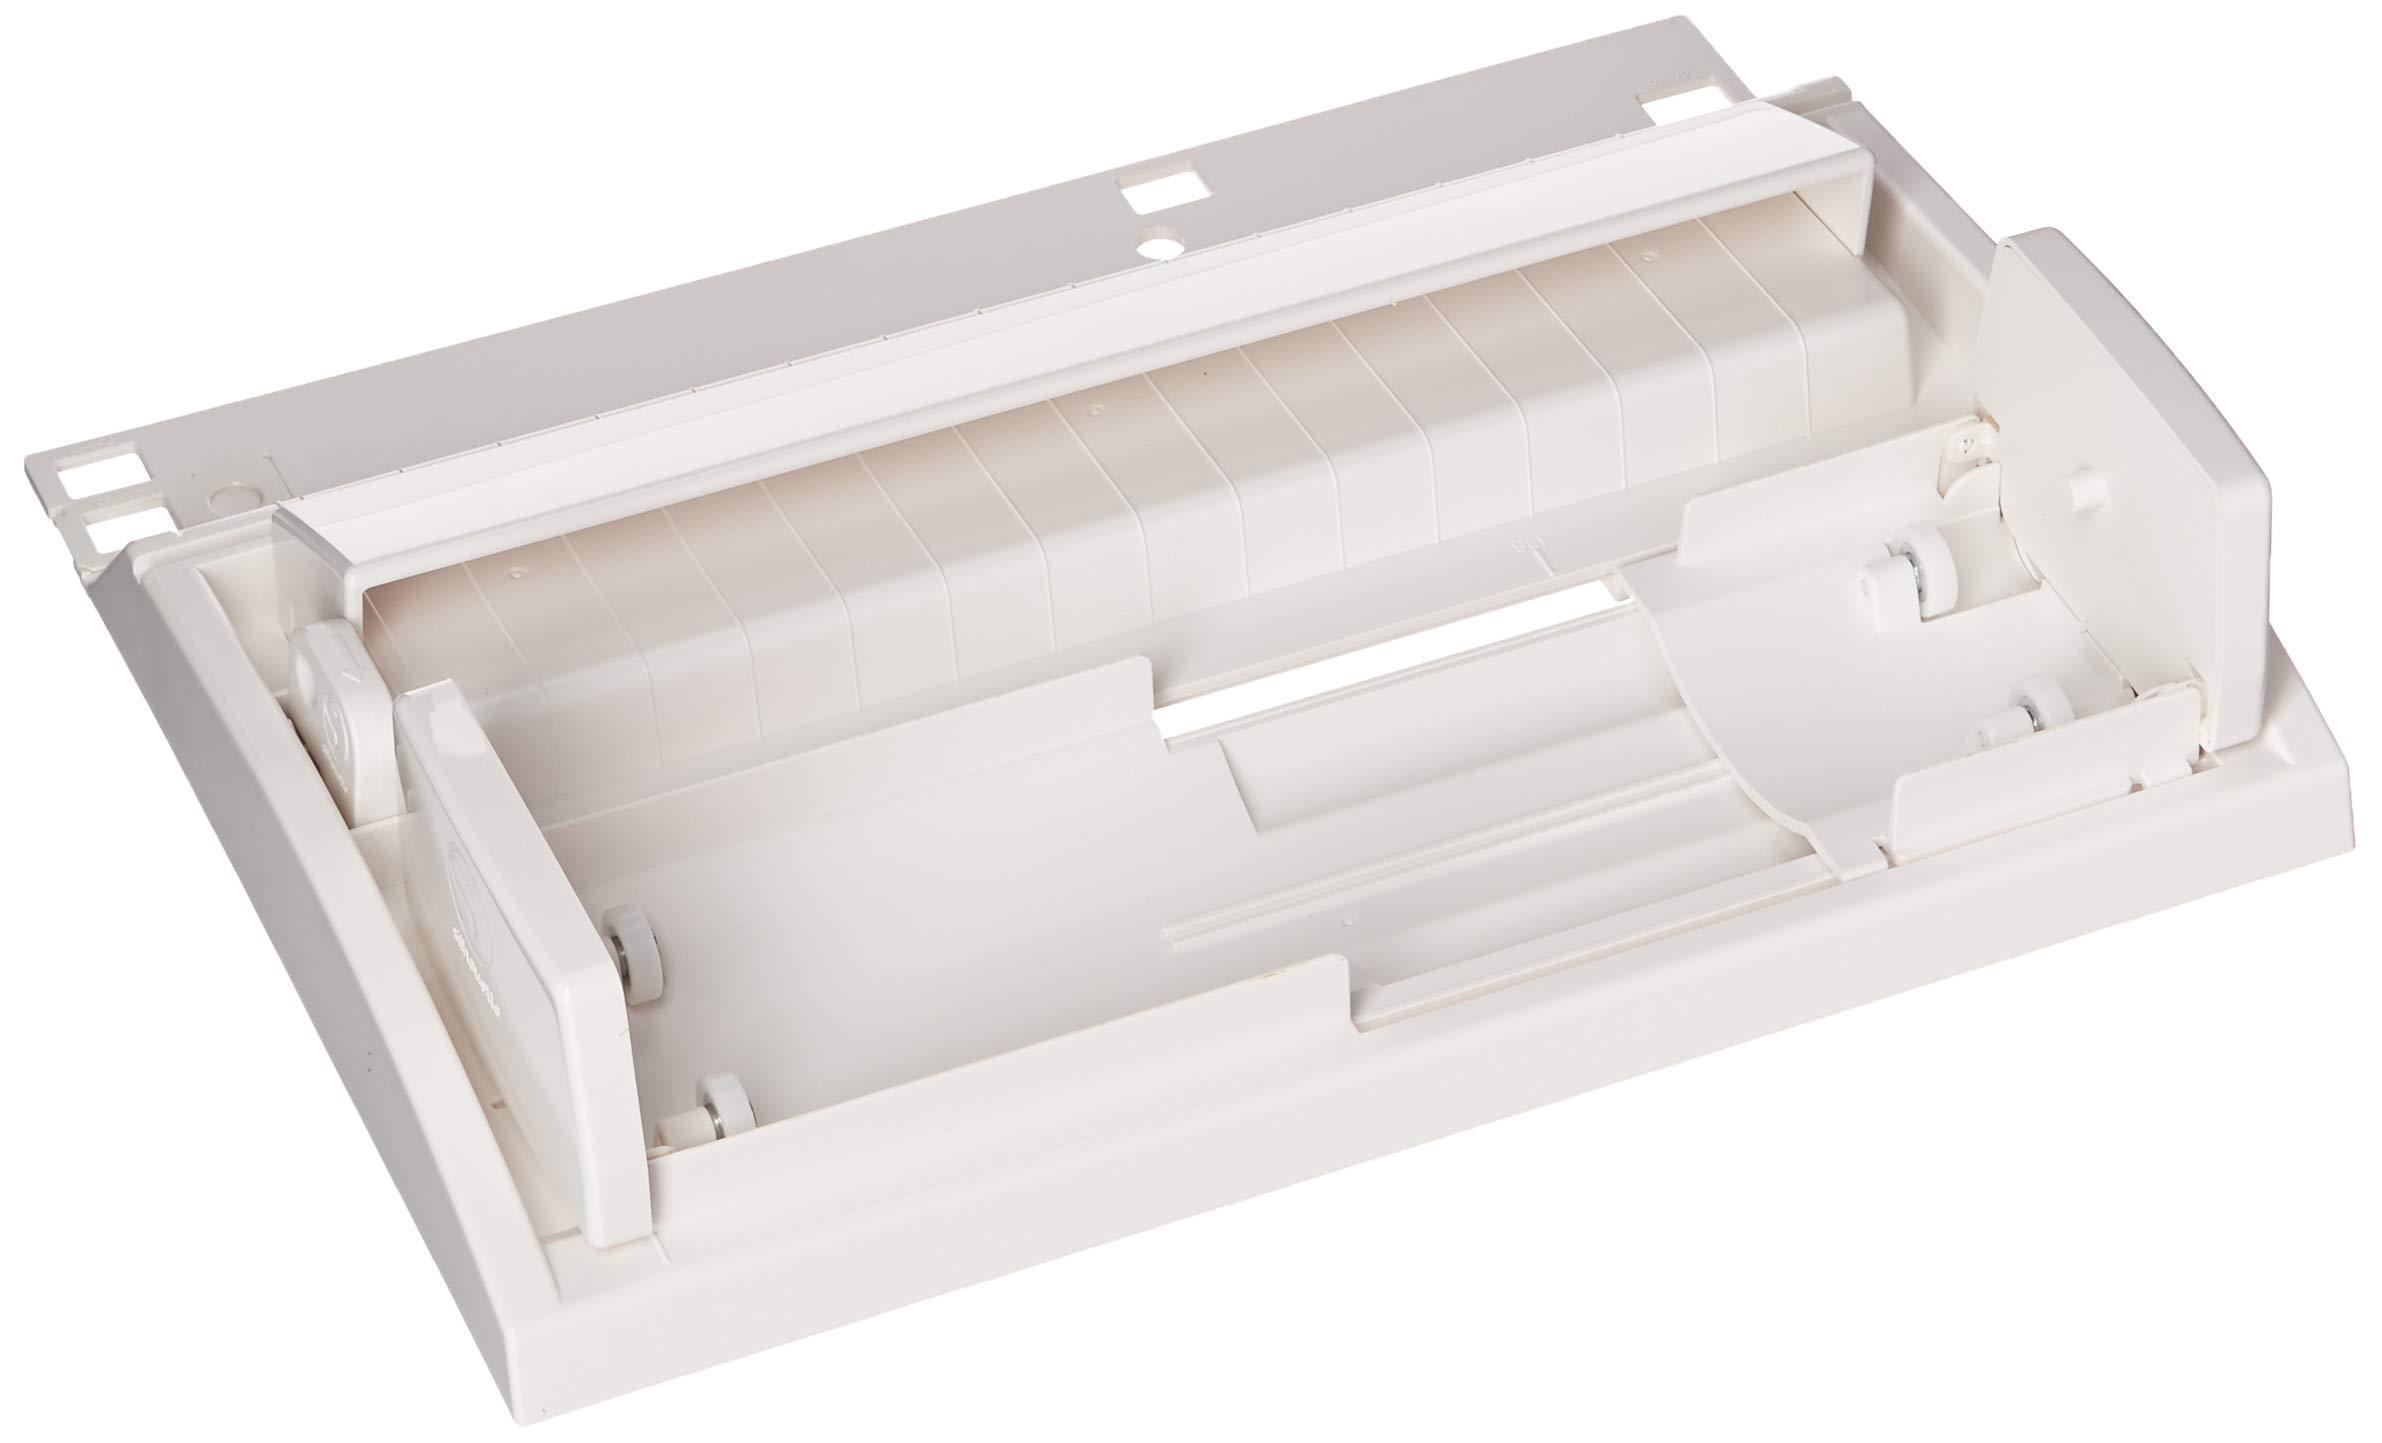 Silhouette America Roll-Feeder, 2.8'' X 15.2'' X 11.6'', White